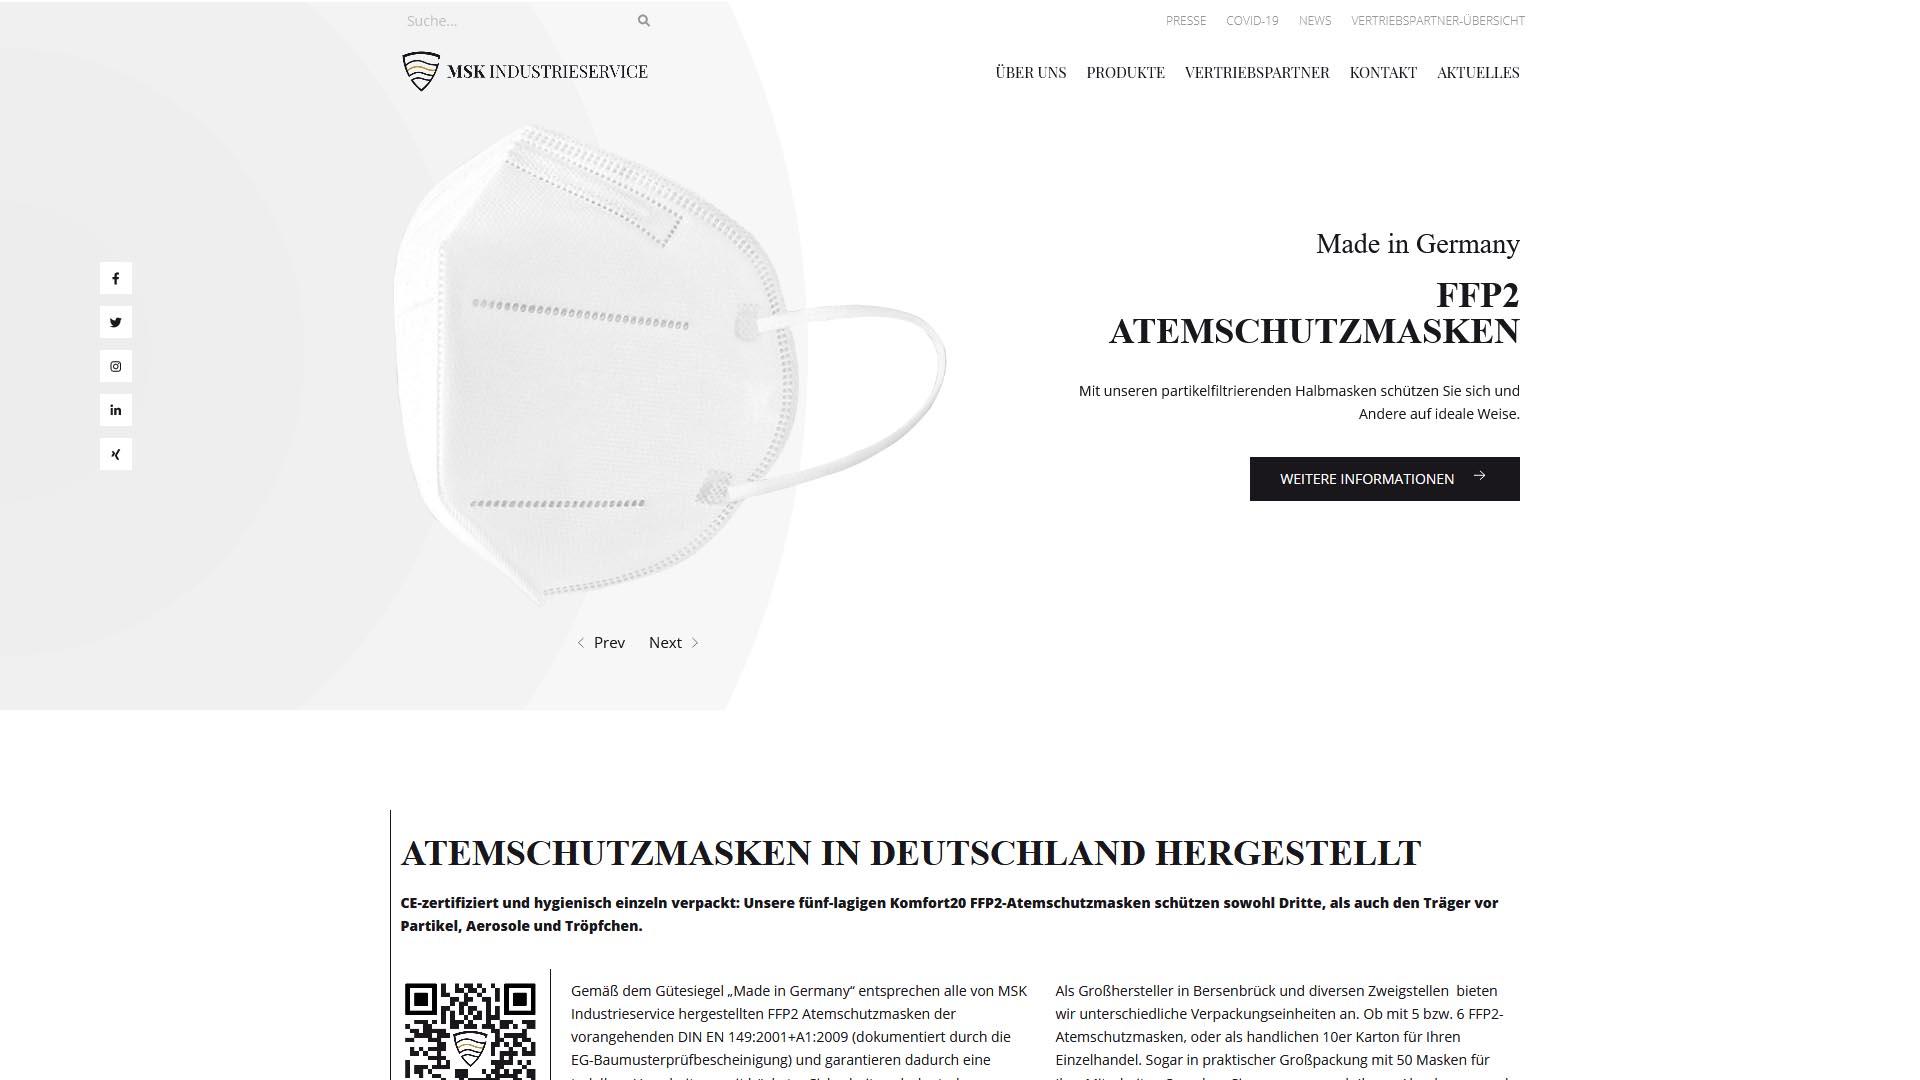 msk industrieservice atemschutzmasken ffp2 relaunch 2